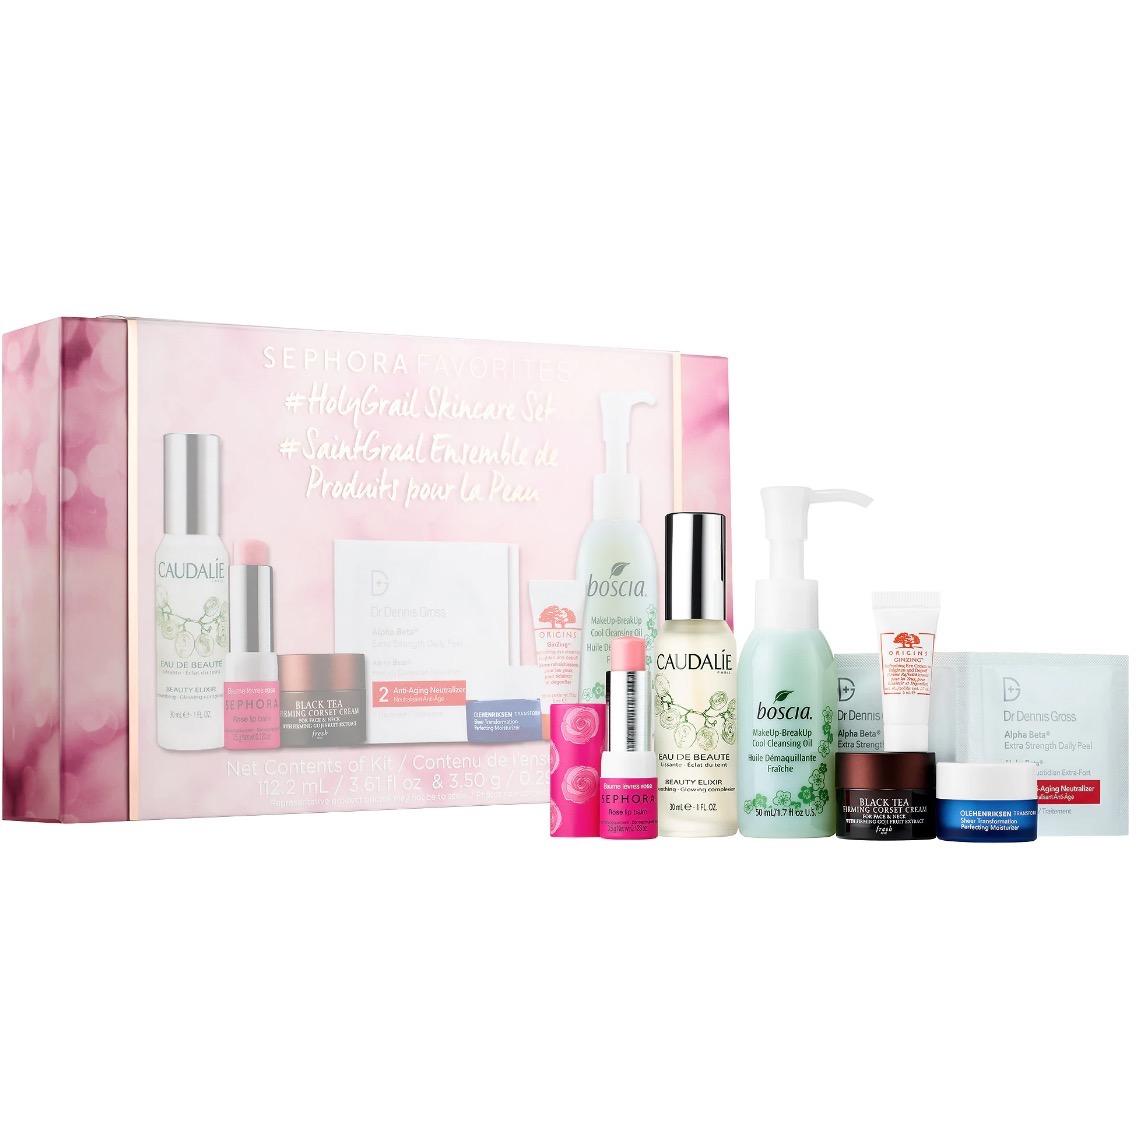 SEPHORA FAVORITES #Holy Grail Skincare Set